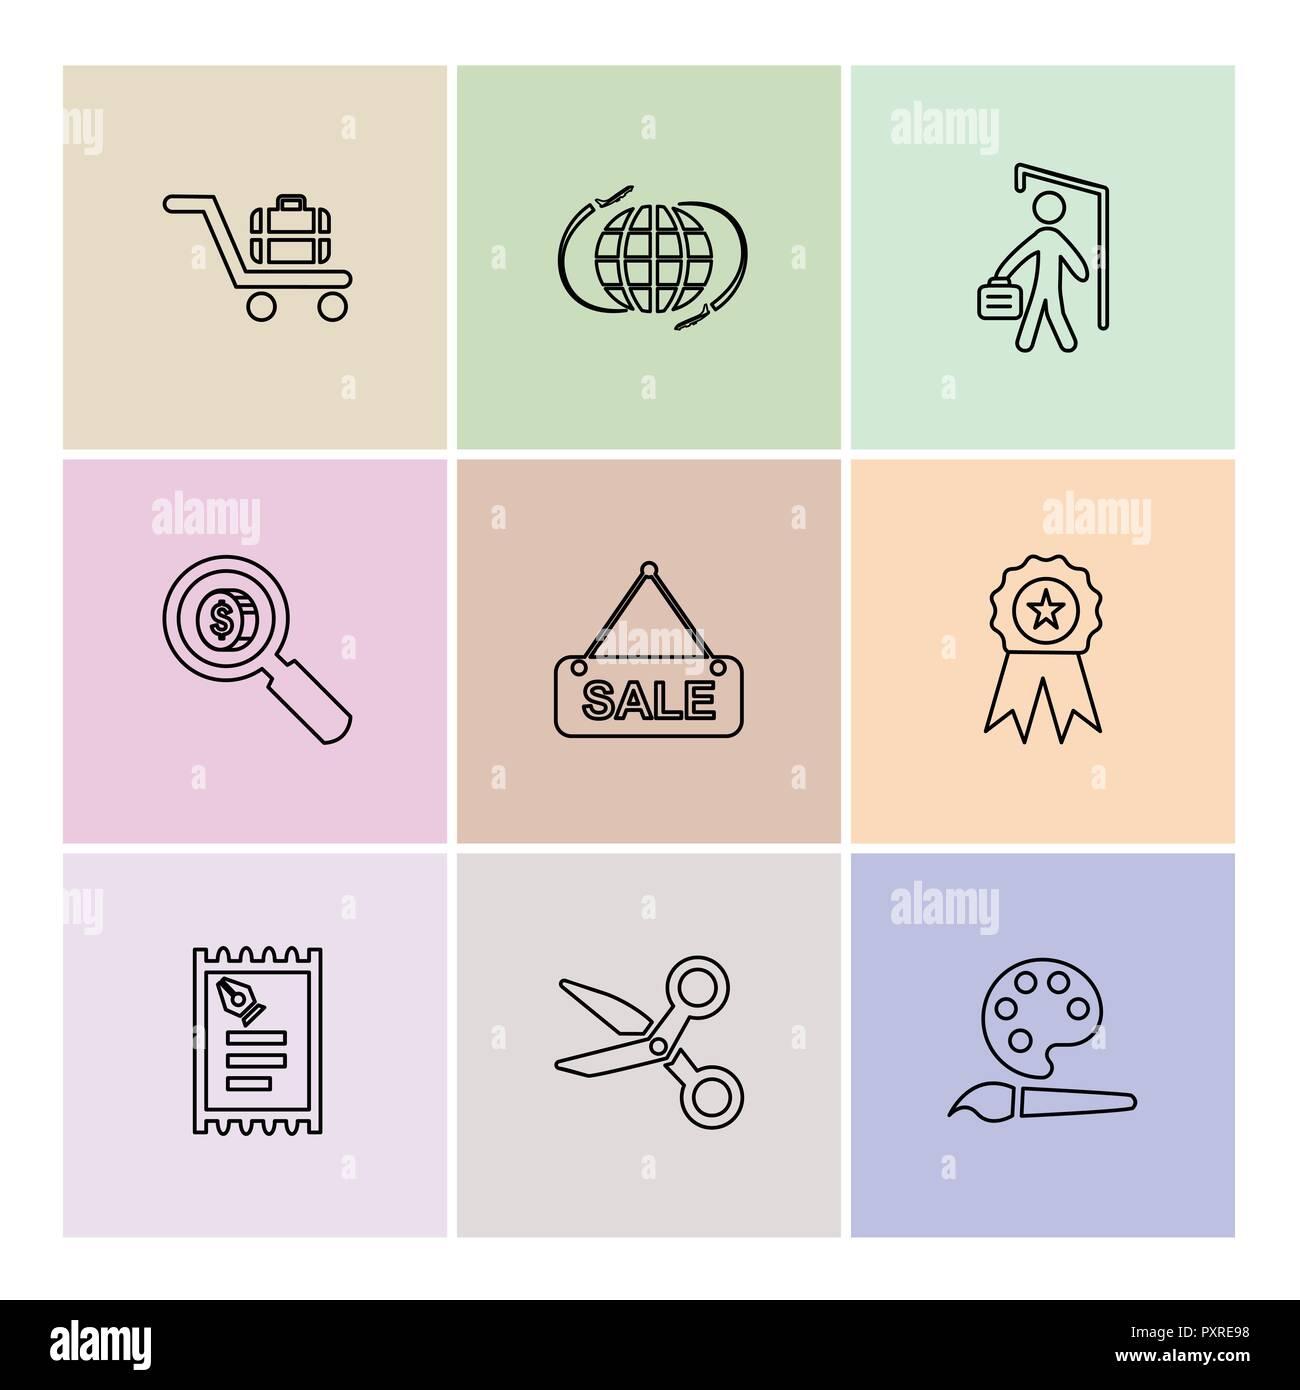 Design Bank Sale.Shopping Money Bank Dollar Invoice Idea Bulb Time